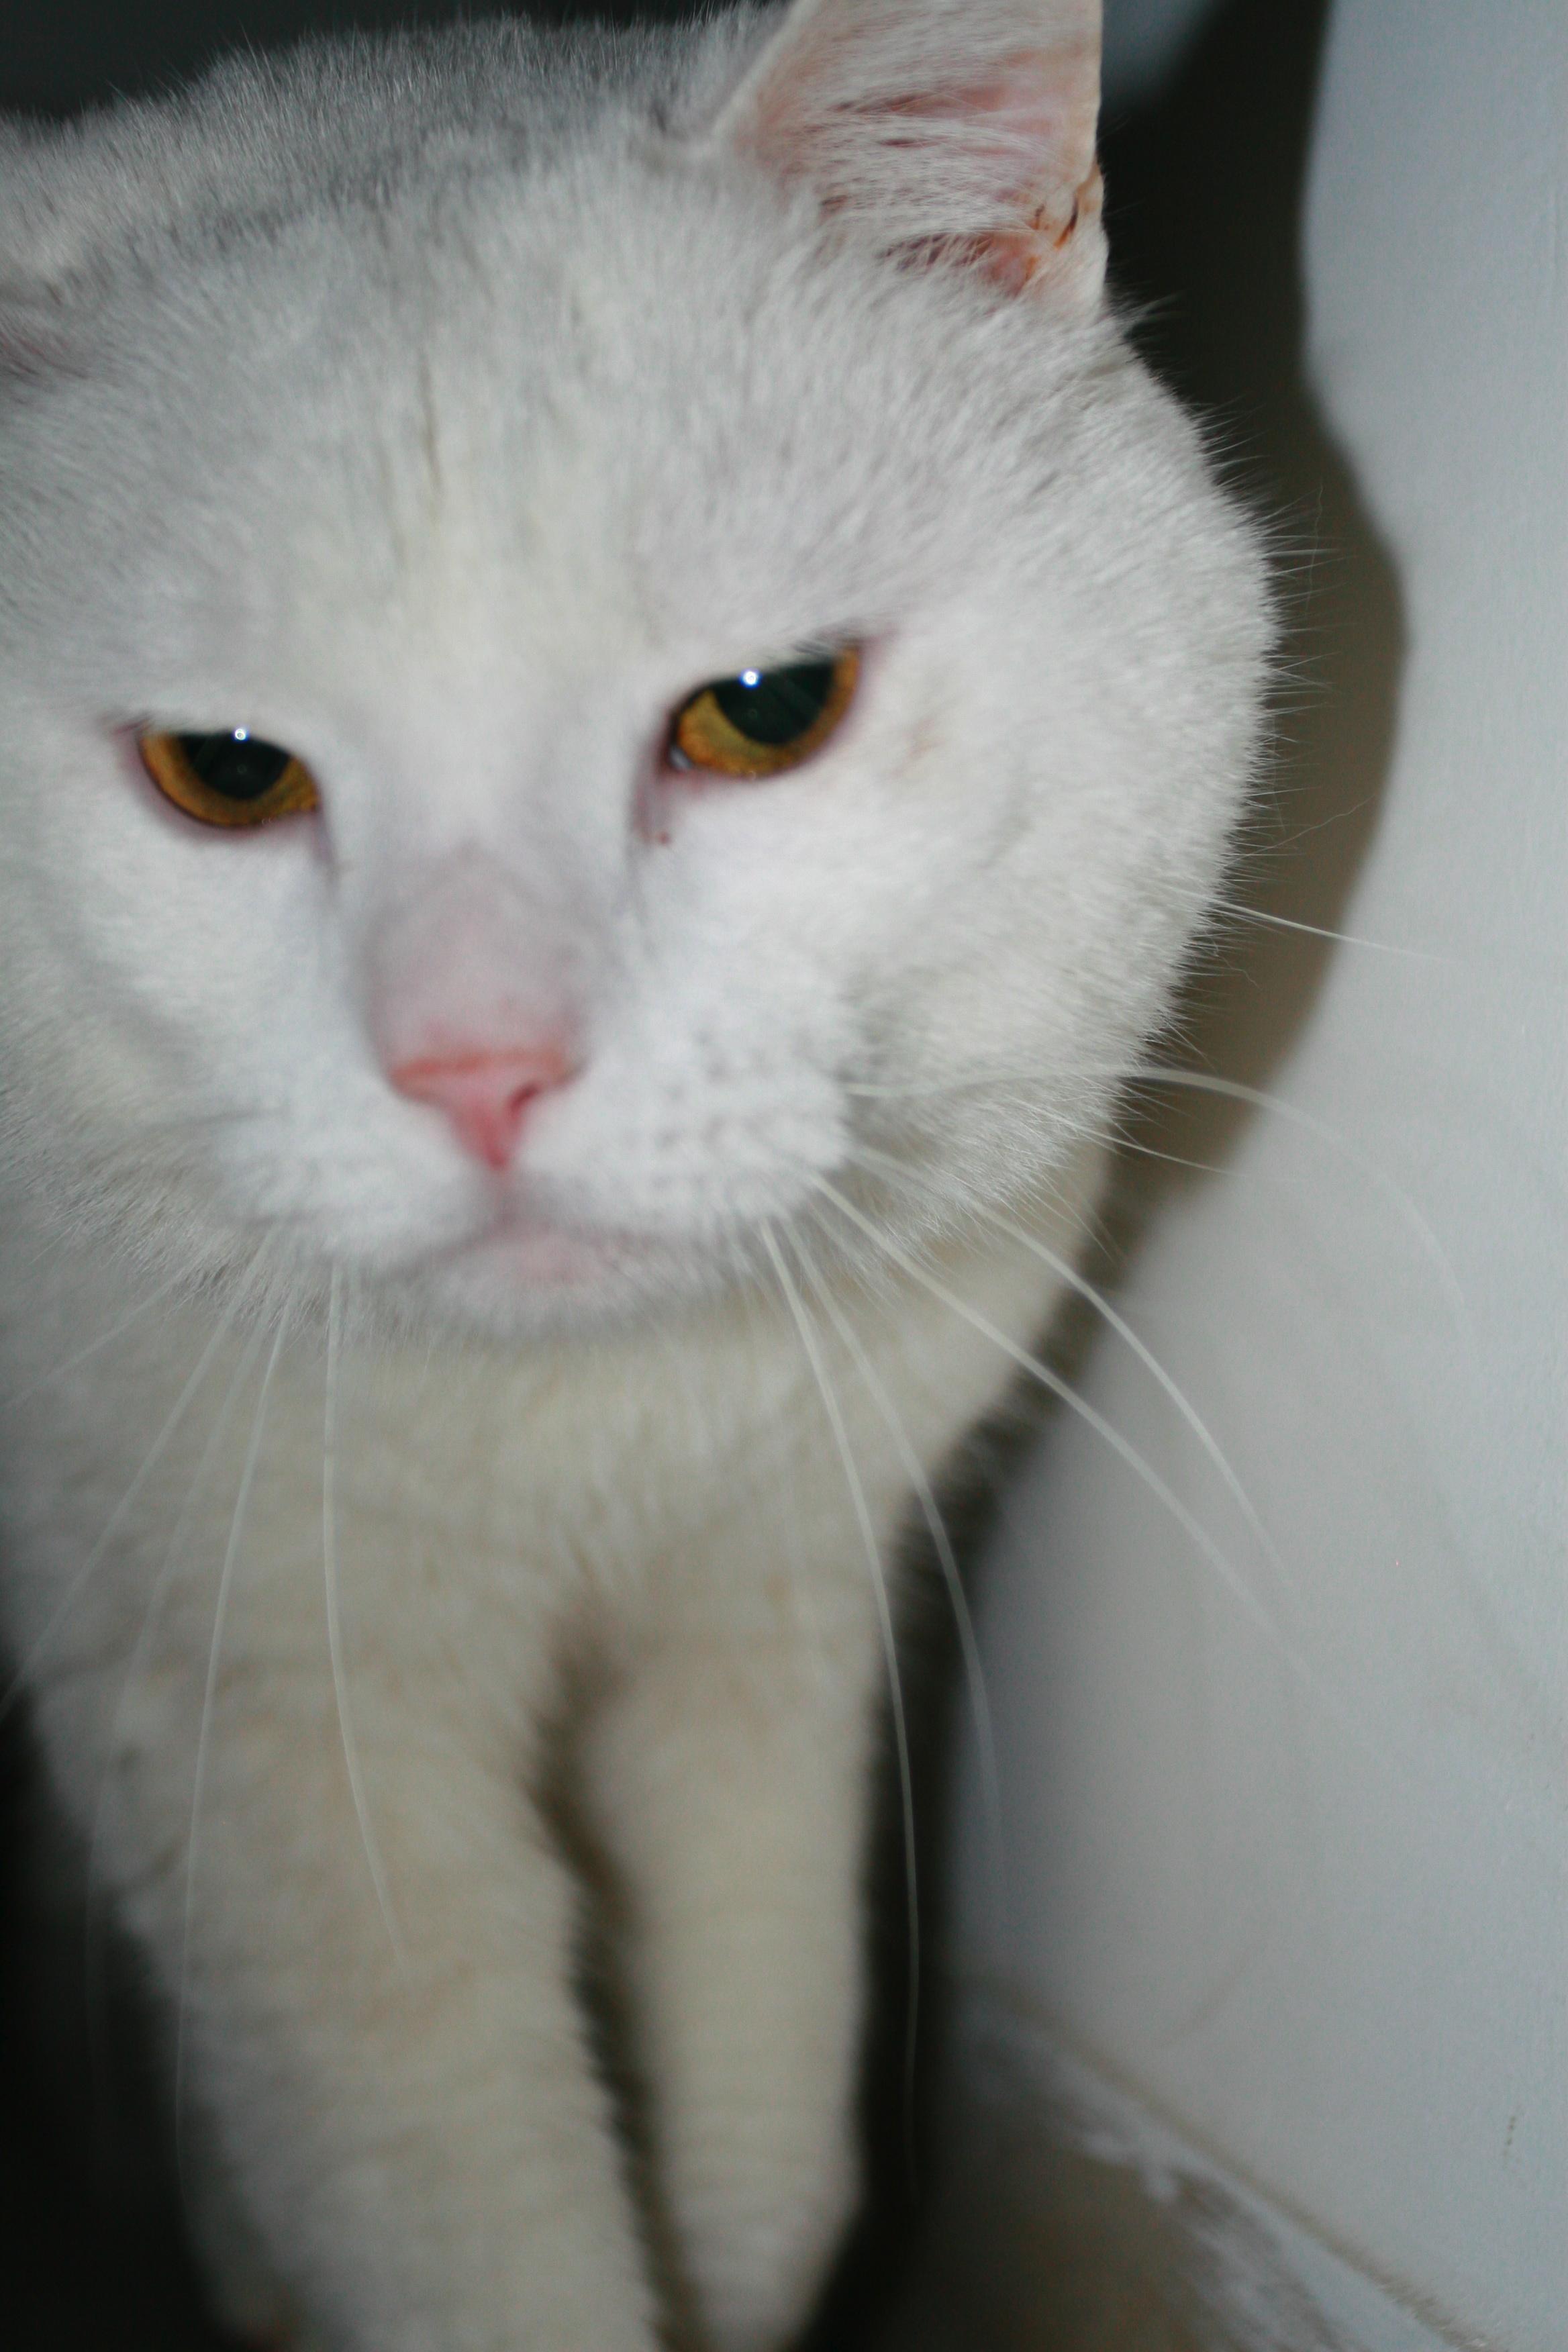 Virgola, Animal, Big, Bspo06, Cat, HQ Photo